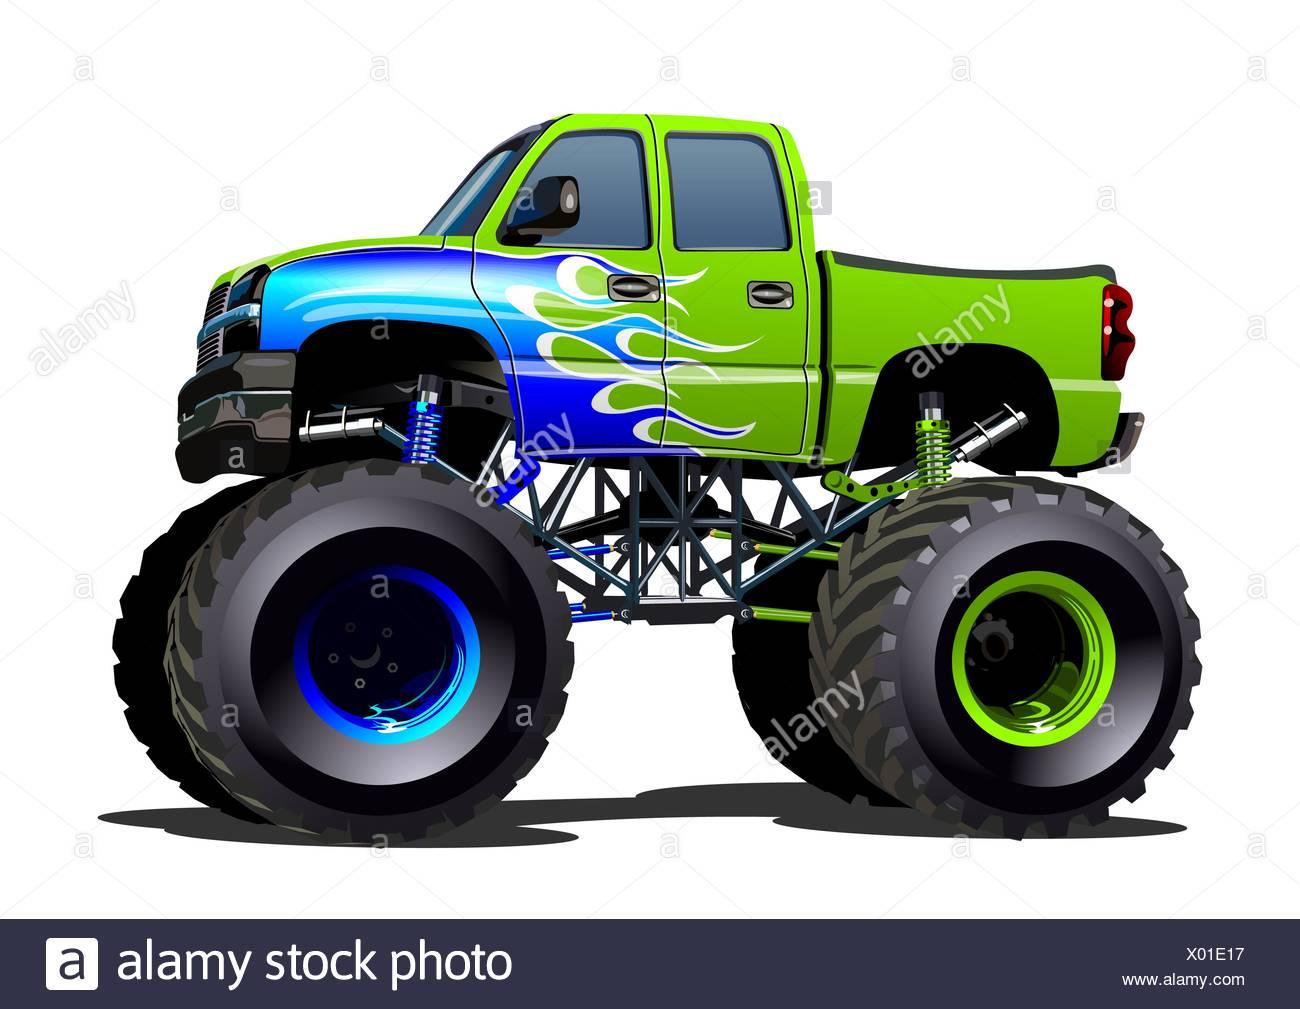 Cartoon Monster Truck Stock Photo Alamy